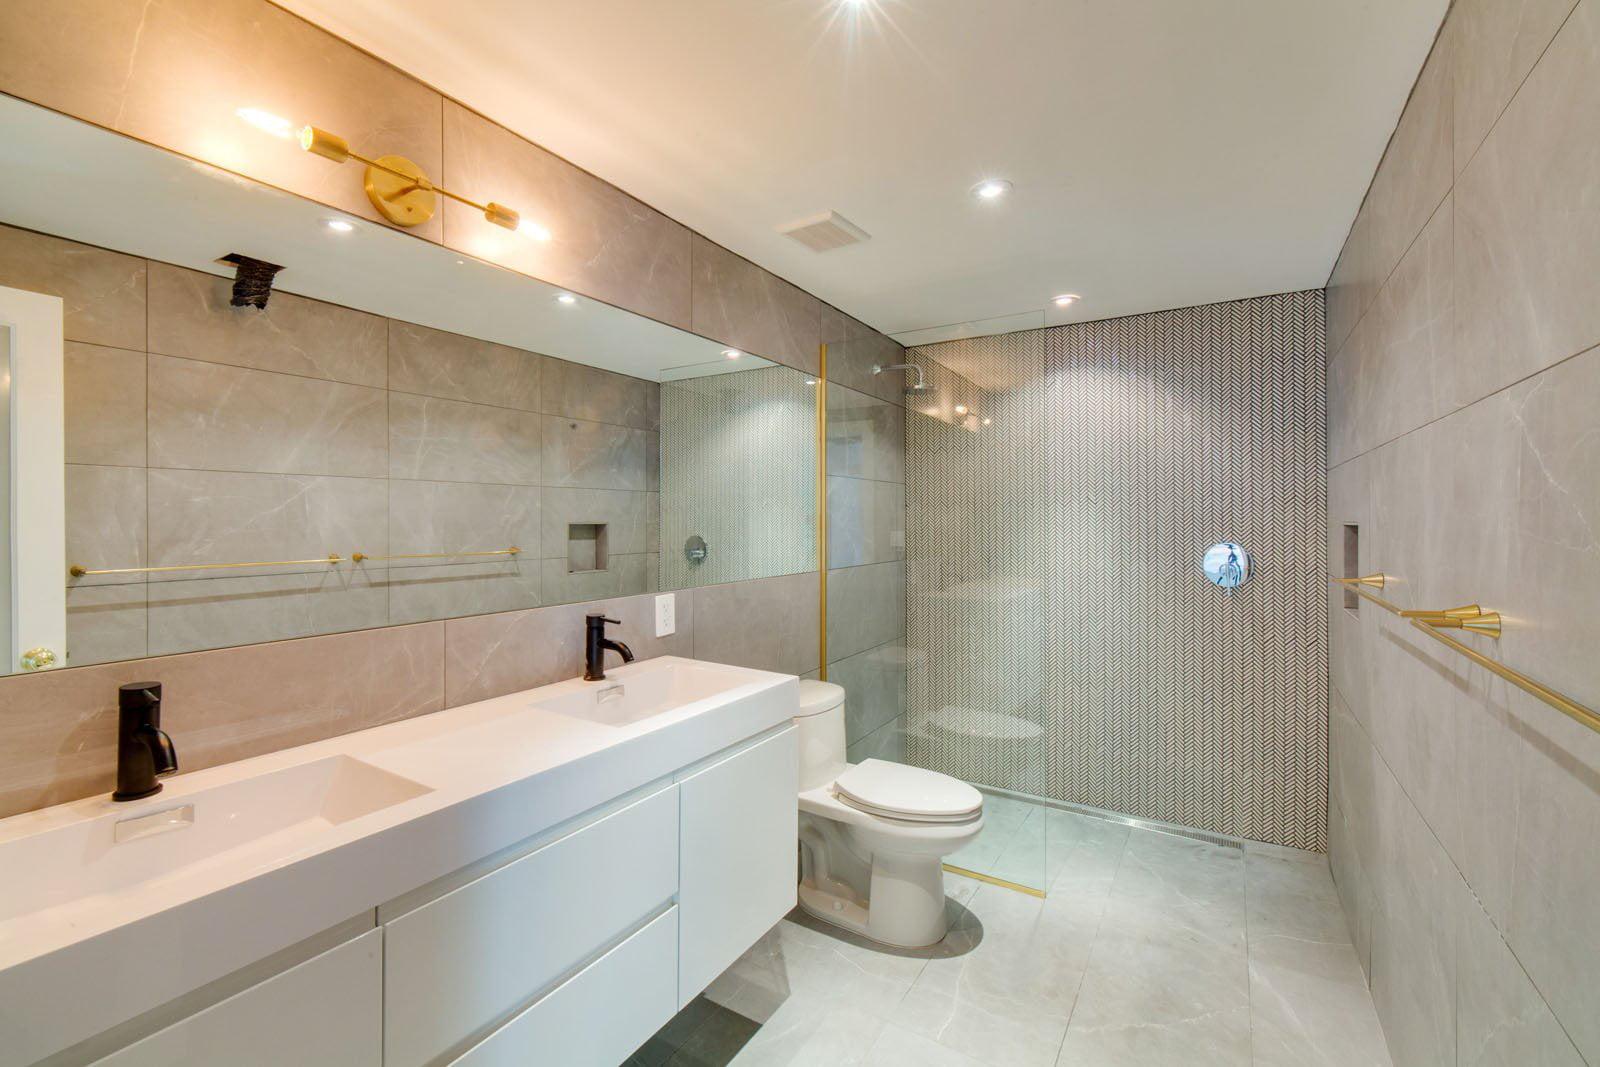 Image of: Bathroom Lights Vanity Lighting Mid Century Modern Brass Vanity Bathroom Lighting Gold Sconce Walmart Com Walmart Com